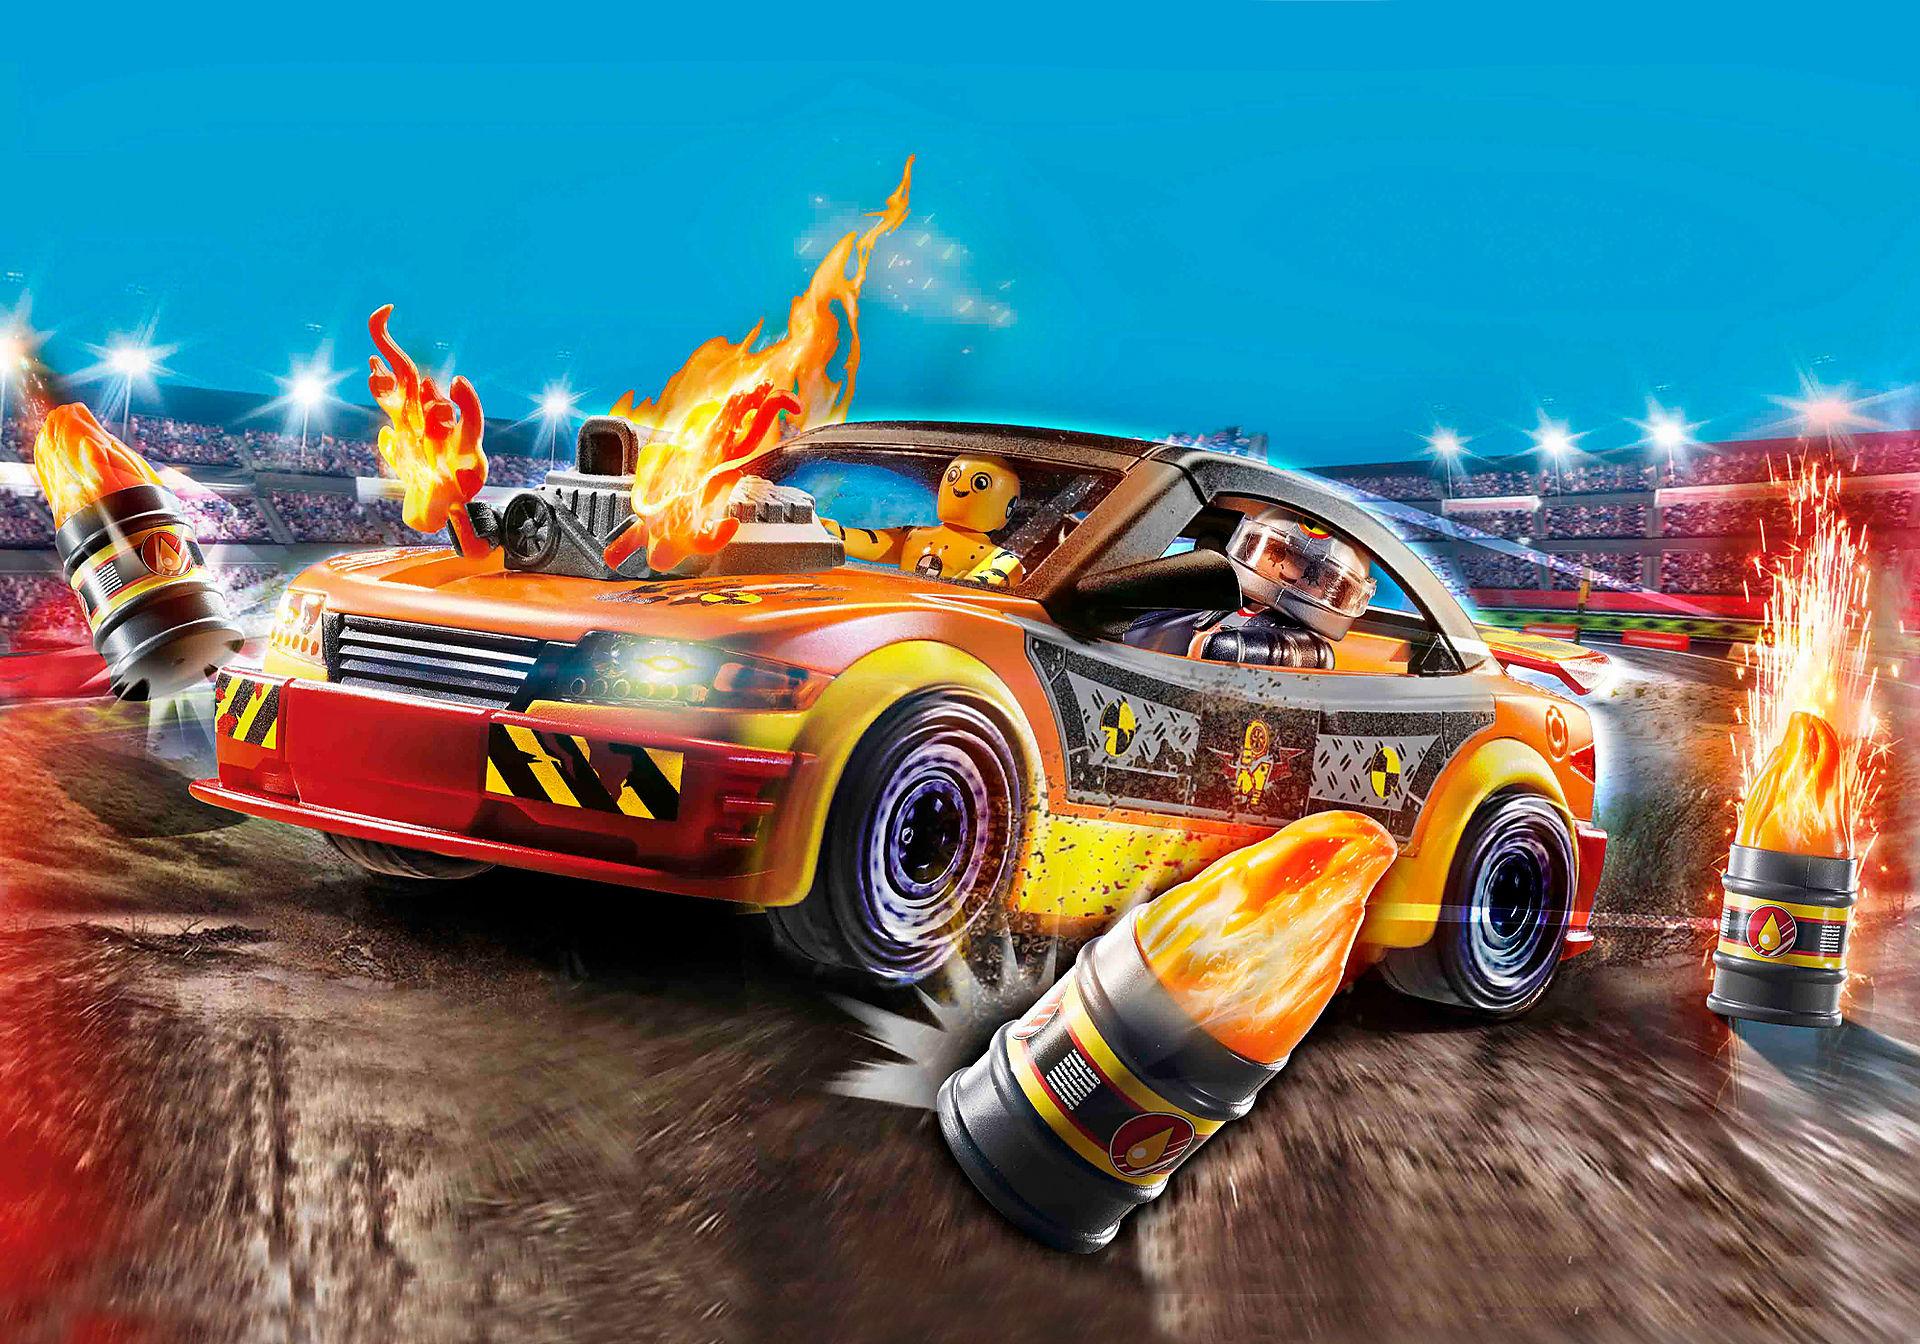 70551 Stuntshow crashcar zoom image1